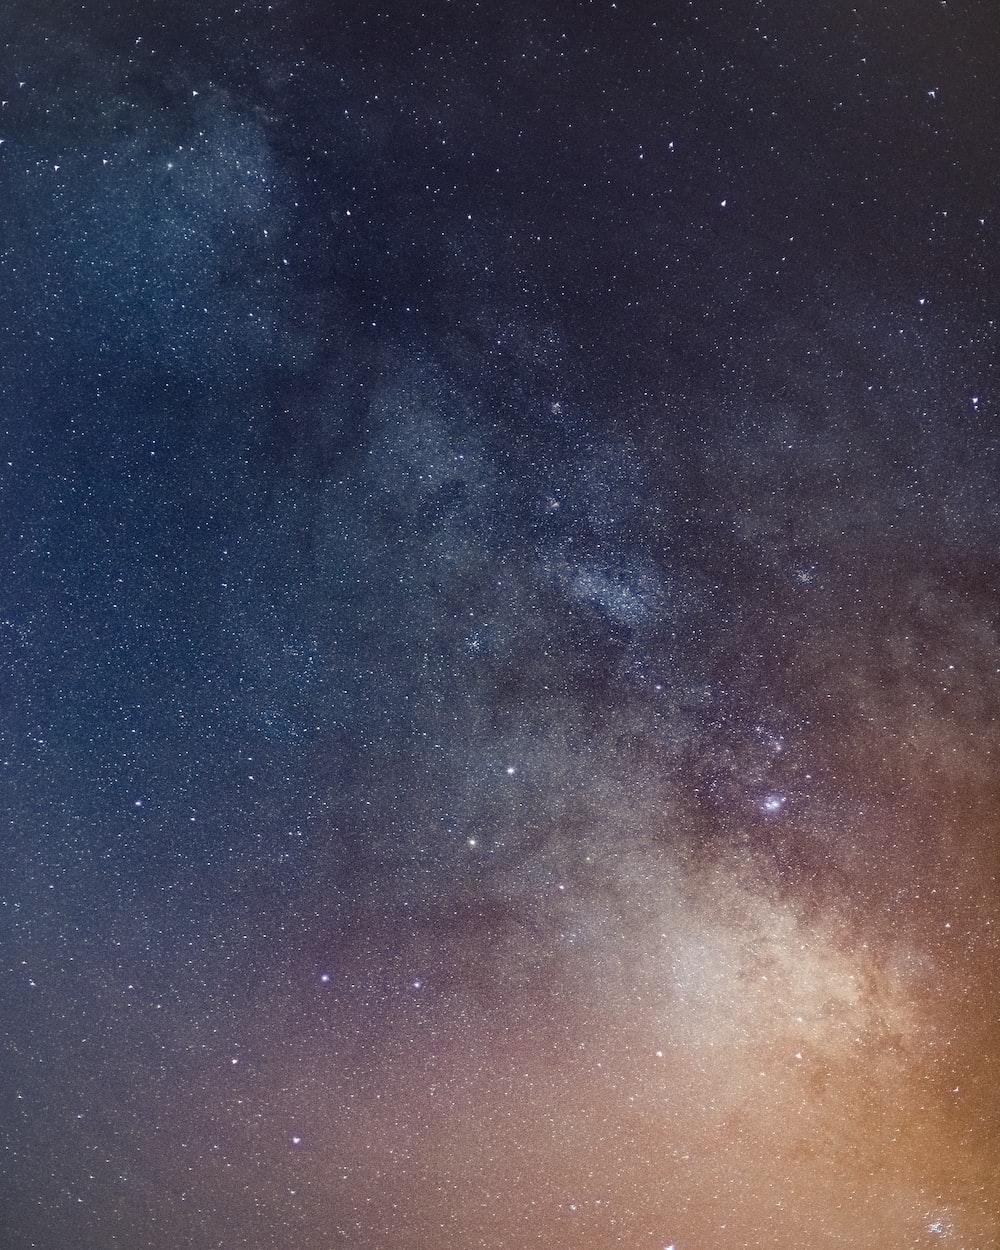 blue and orange starry night sky